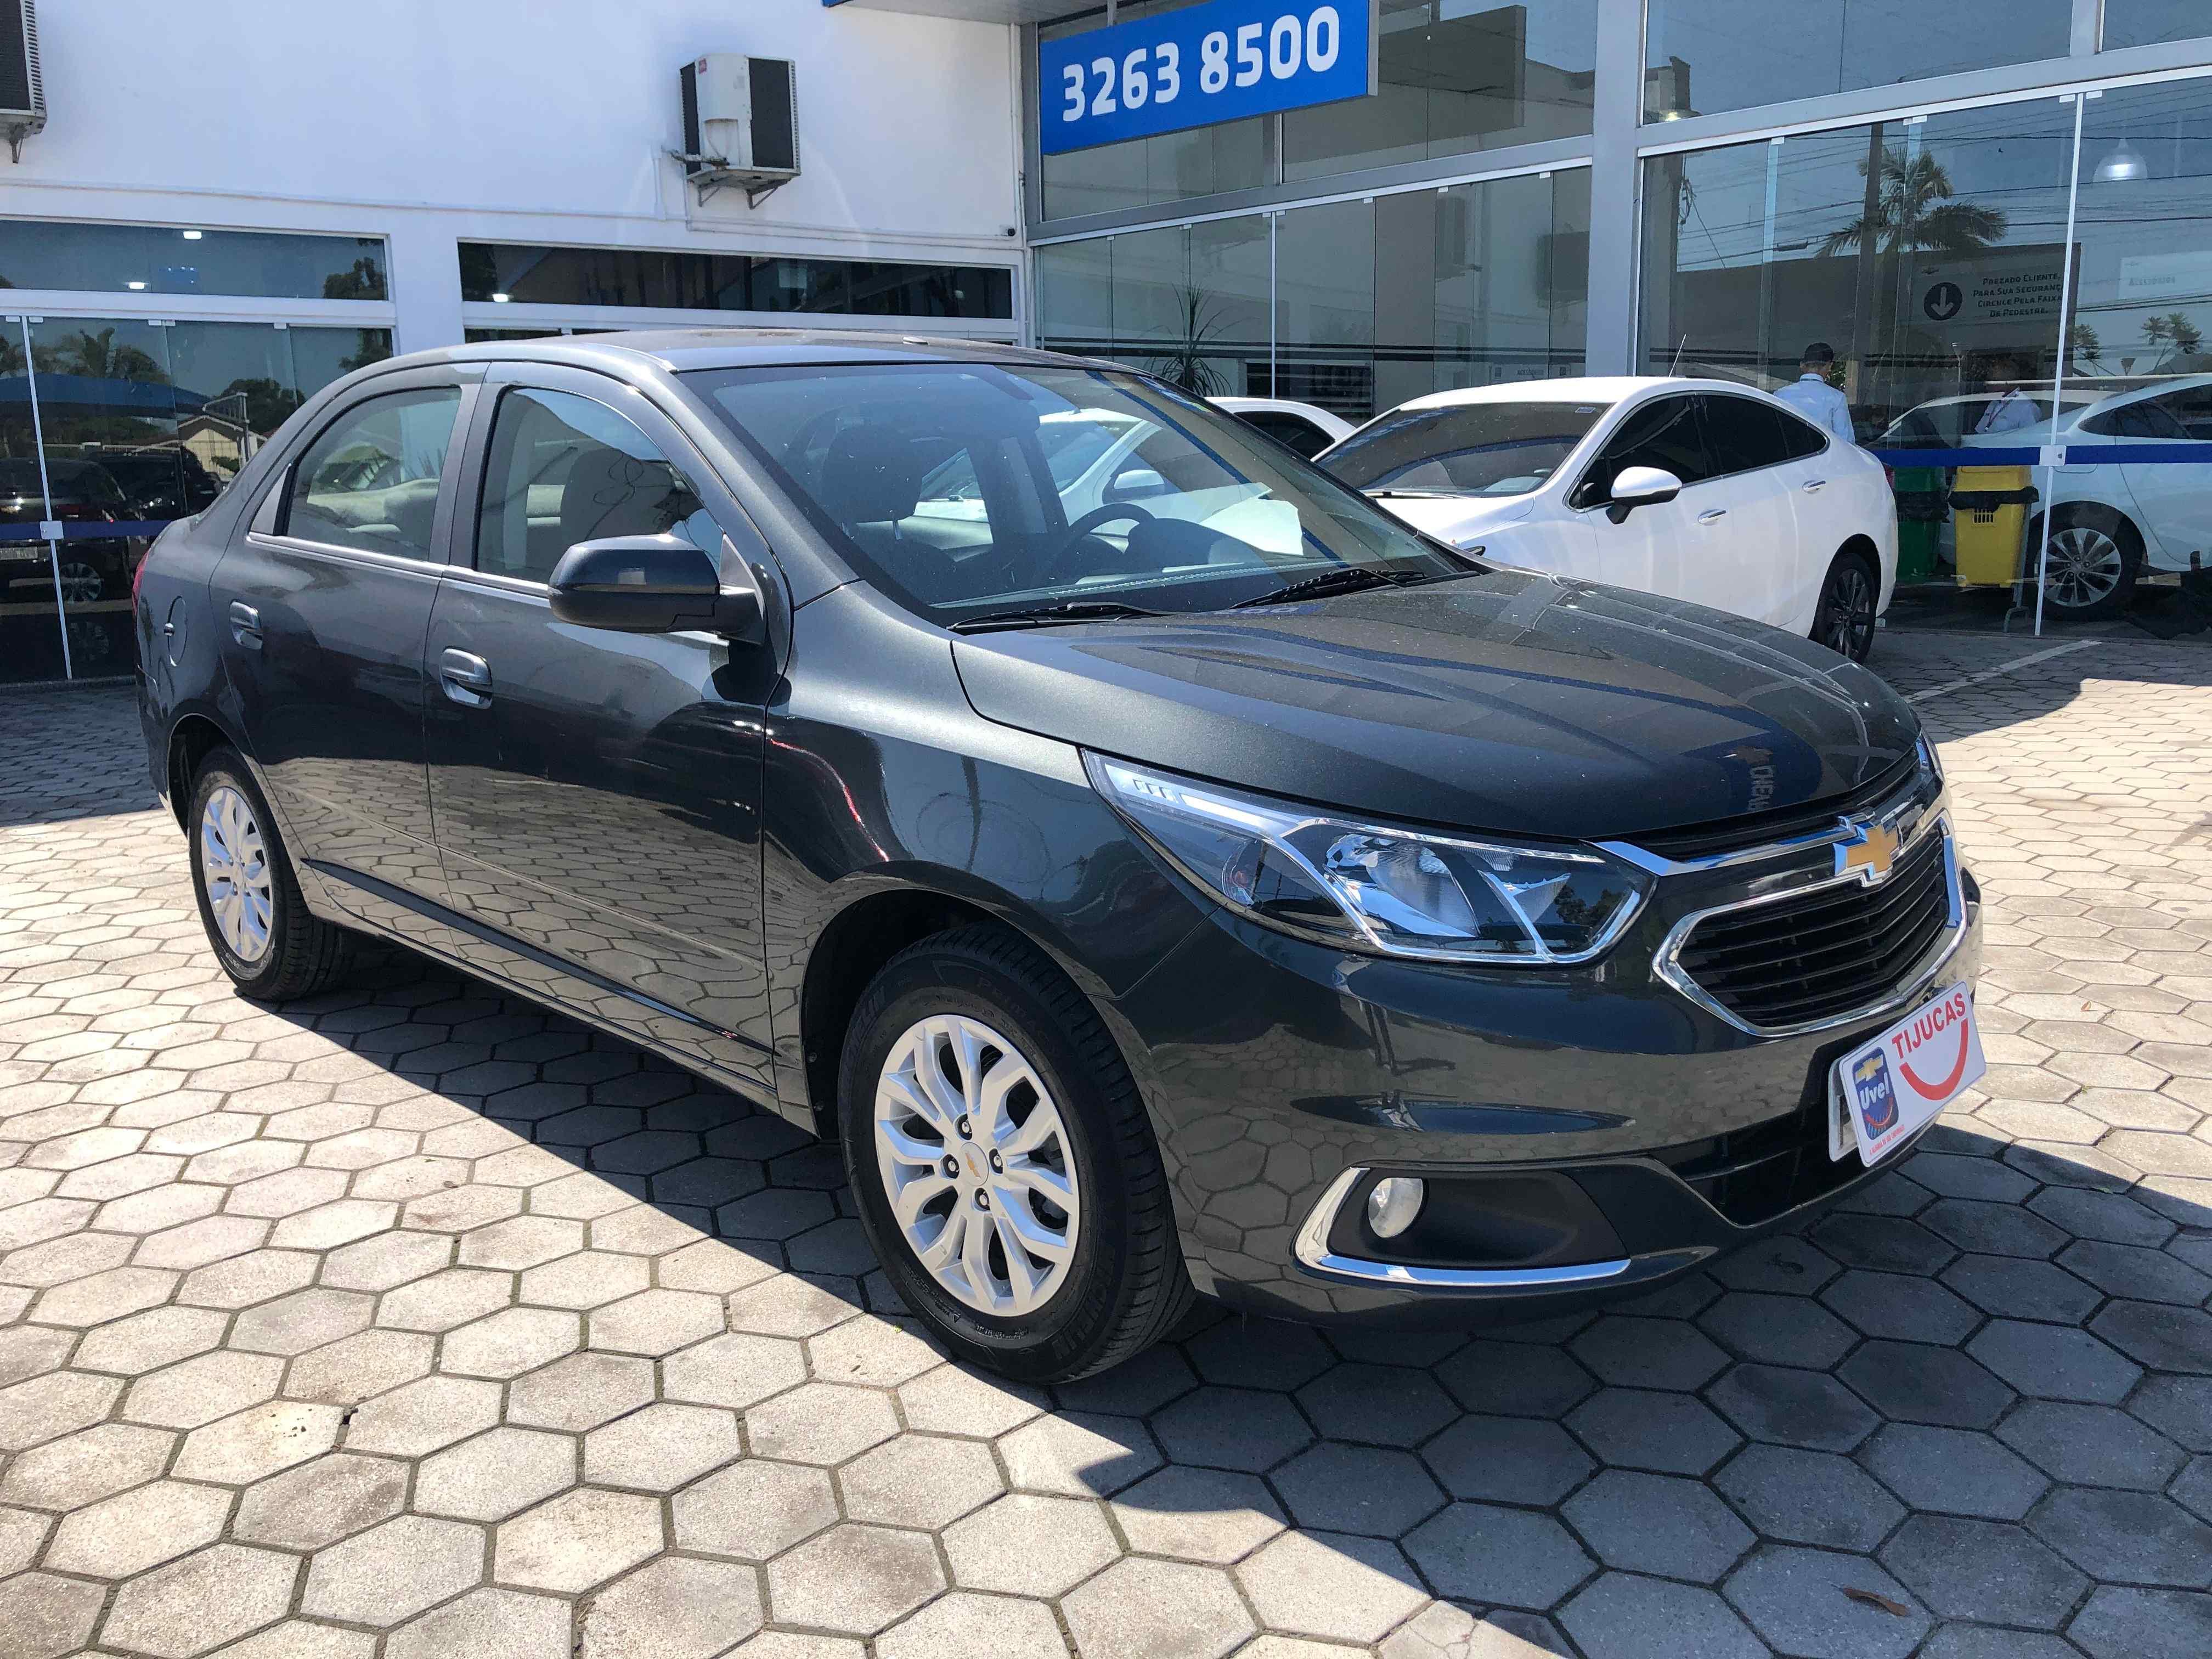 Chevrolet Cobalt LTZ 1.4L 2017